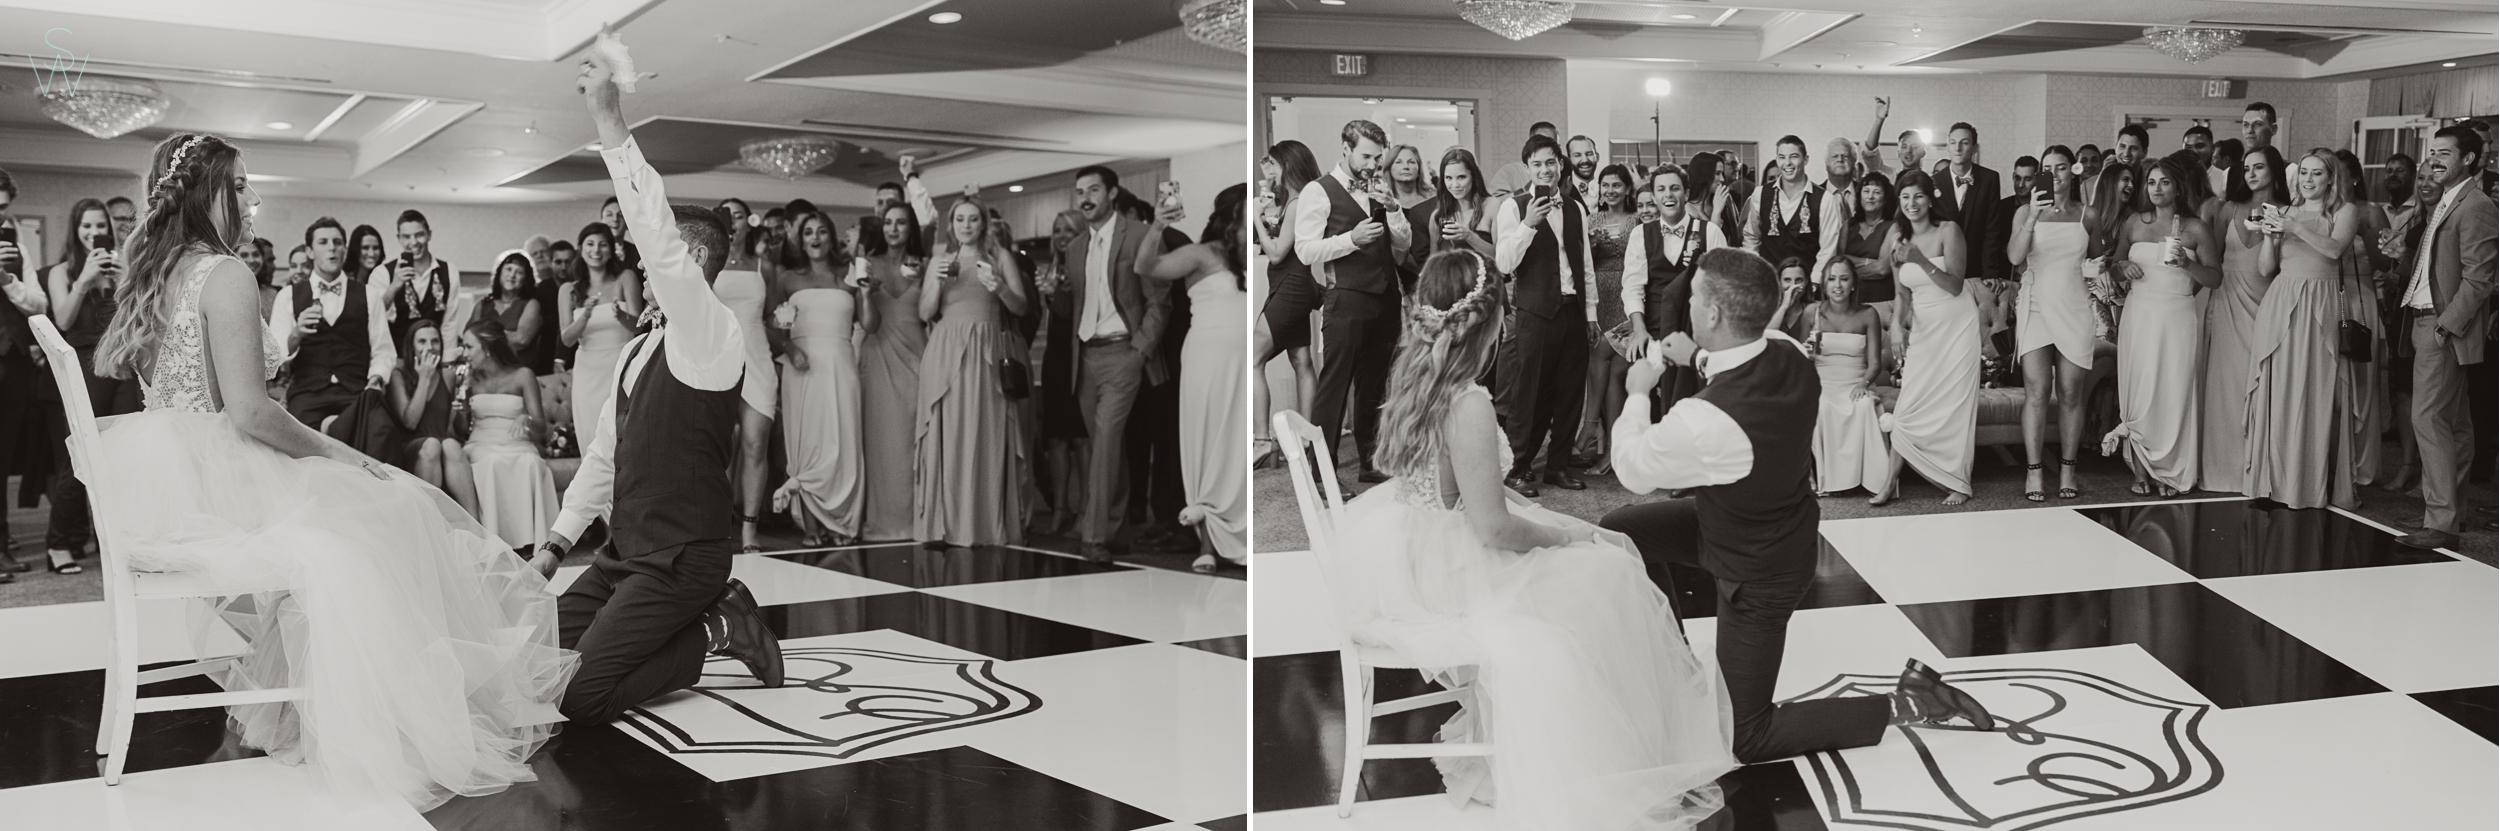 238Lauberge.shewanders.wedding.photography.JPG